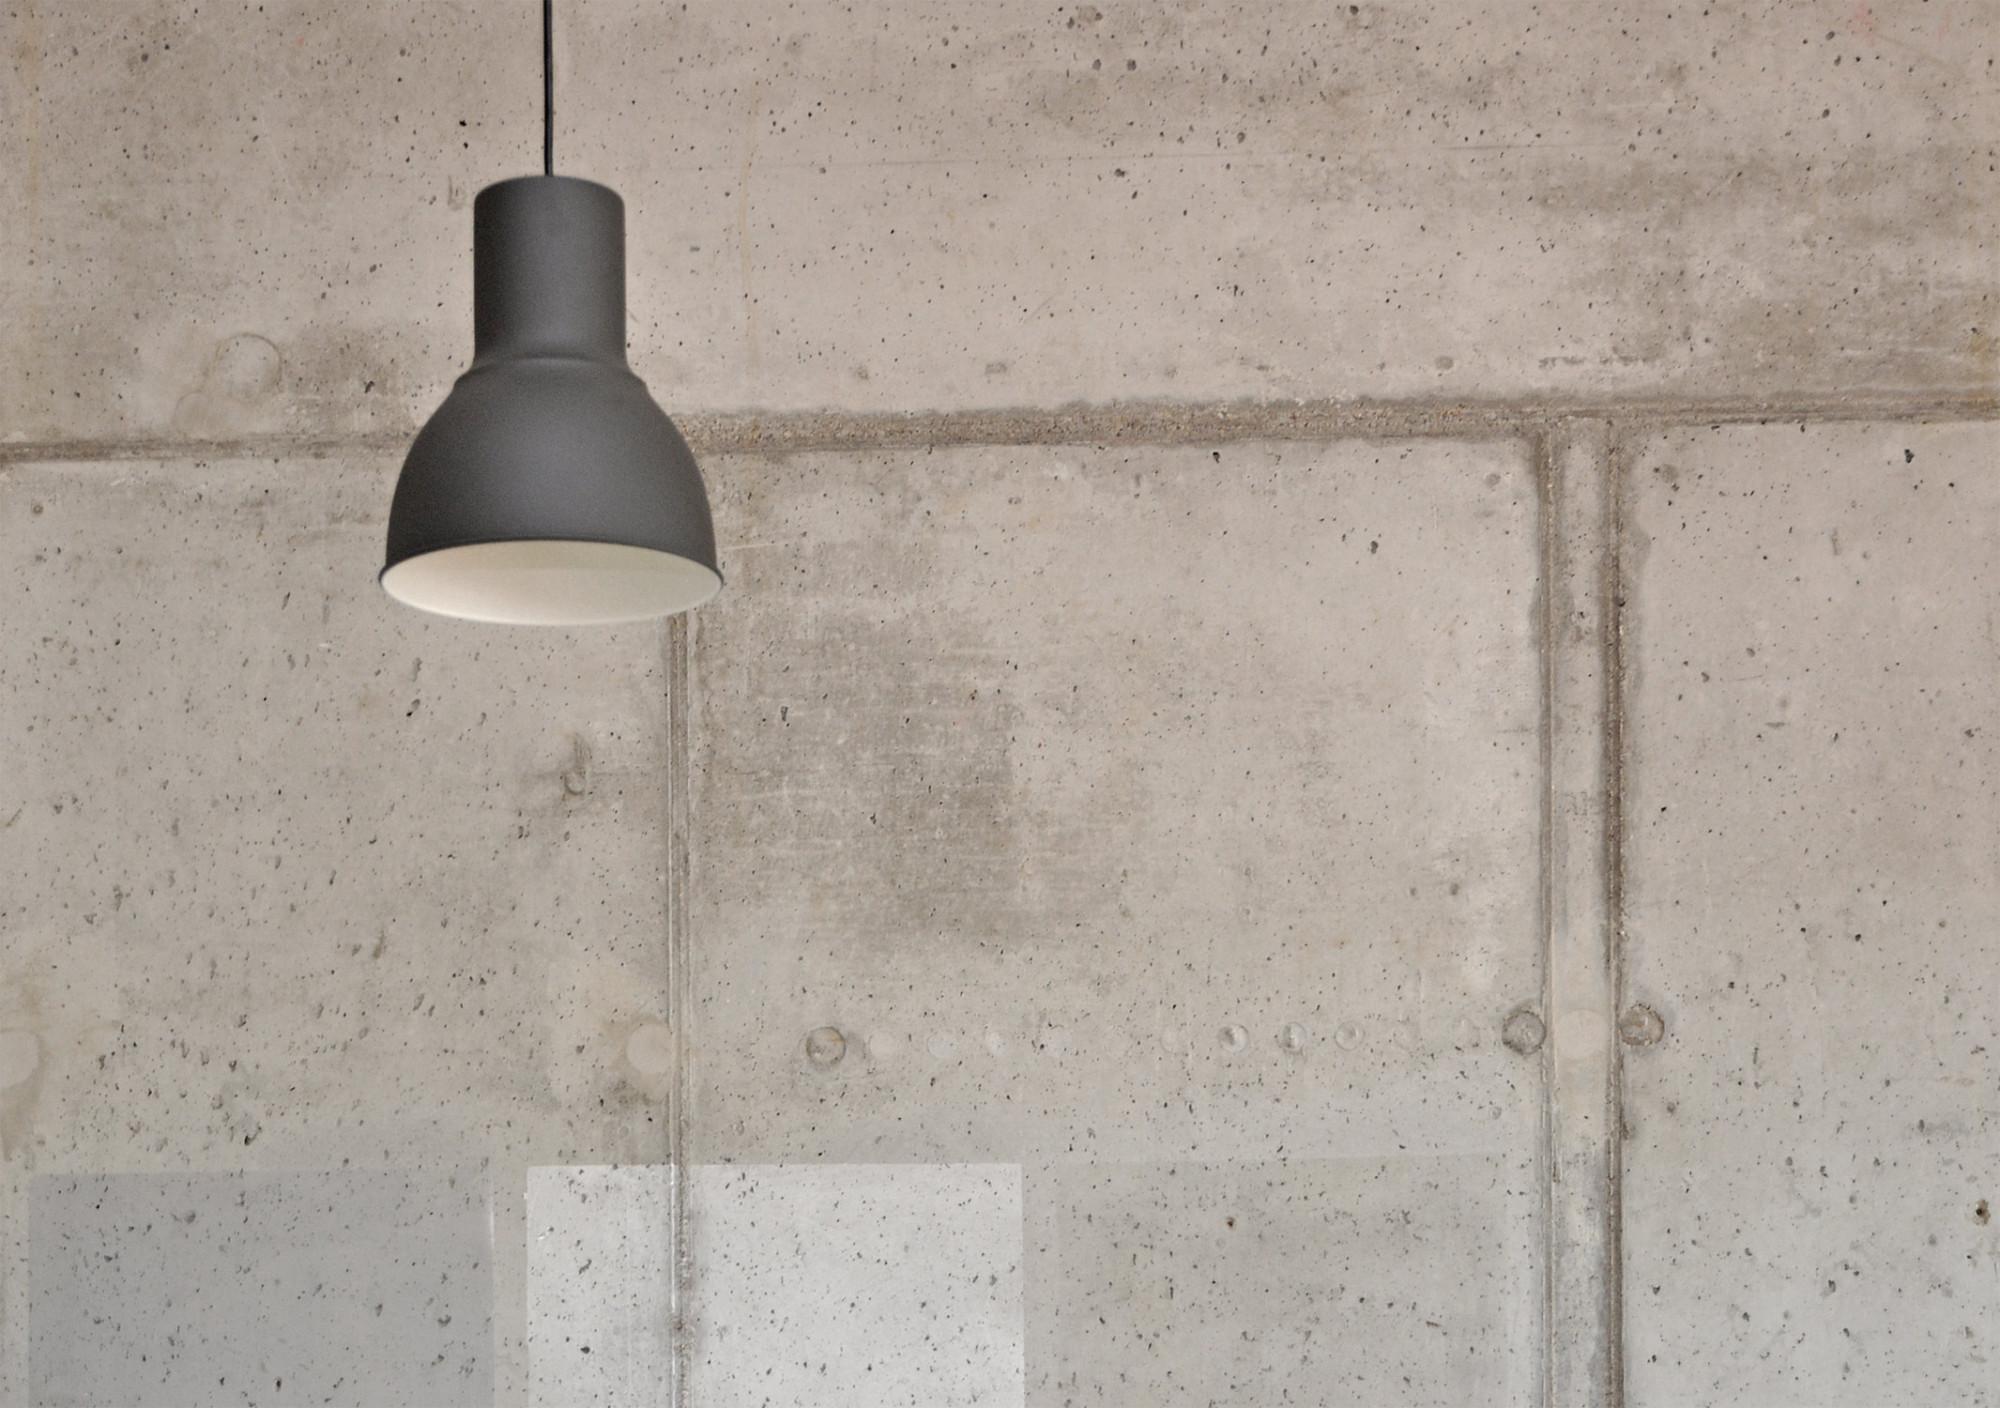 fugenausbildung beton fugen baunetz wissen. Black Bedroom Furniture Sets. Home Design Ideas